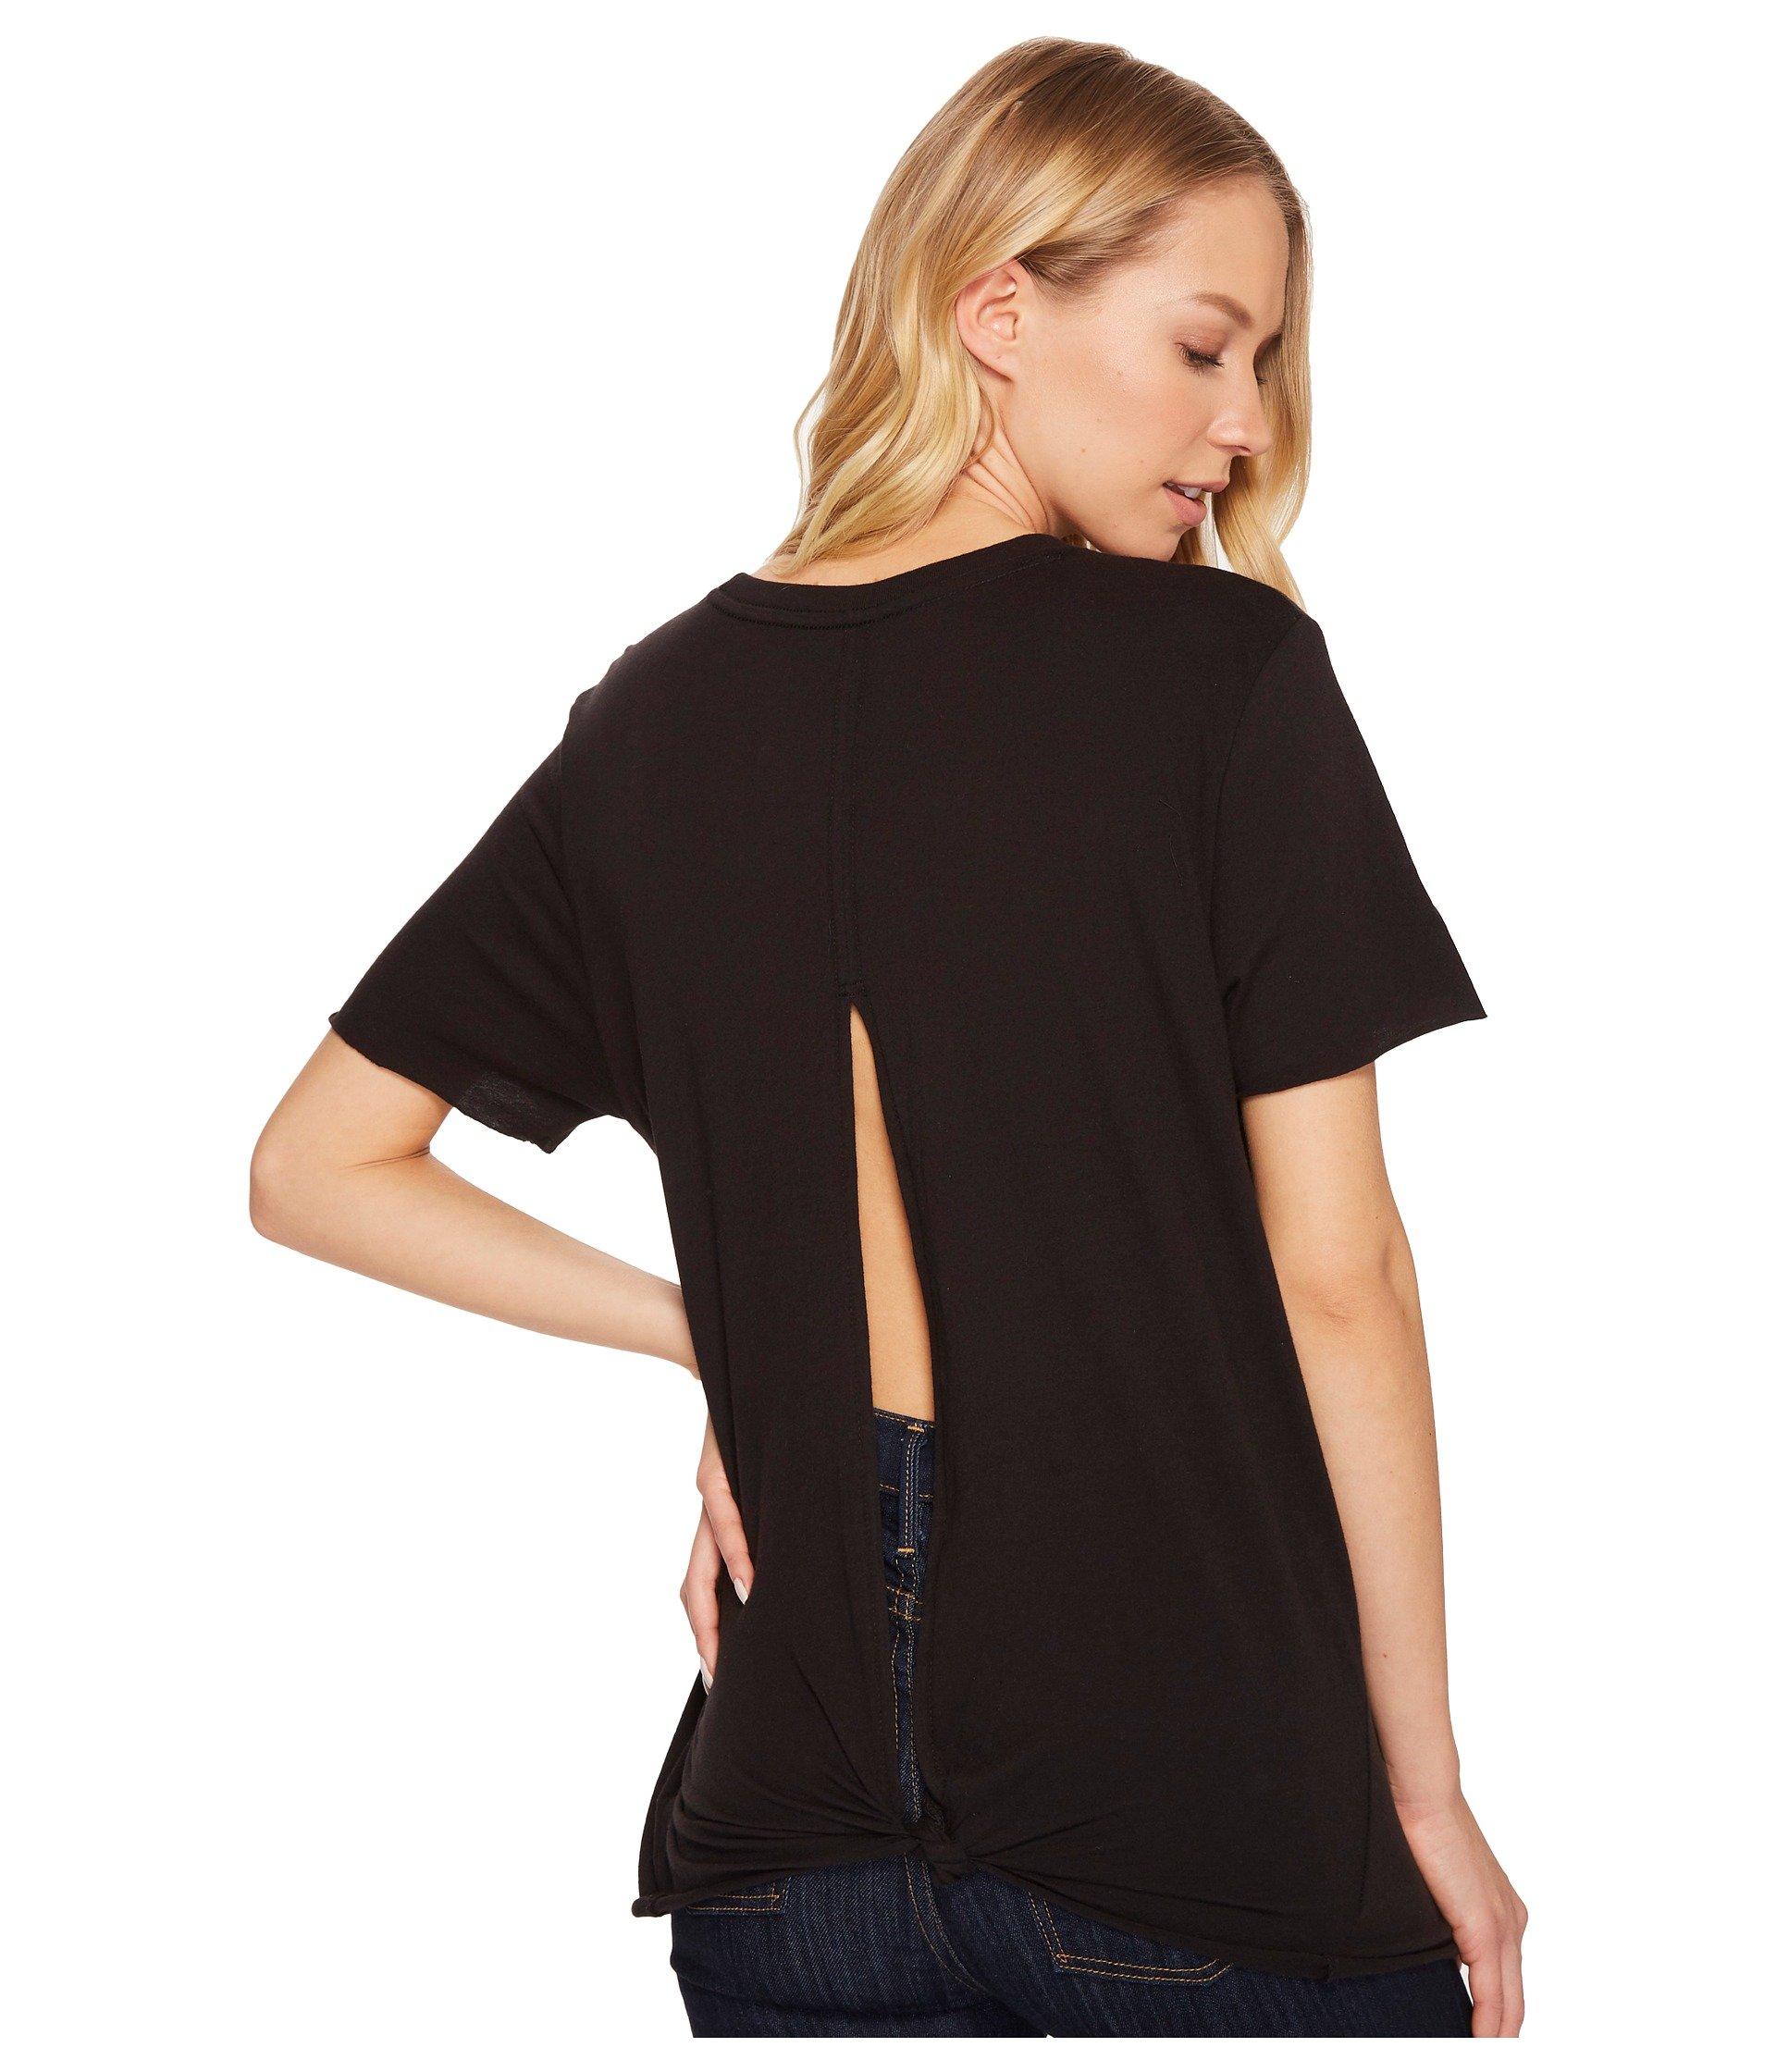 Hurley Women's Cutback Crew Short Sleeve Shirt Black Large